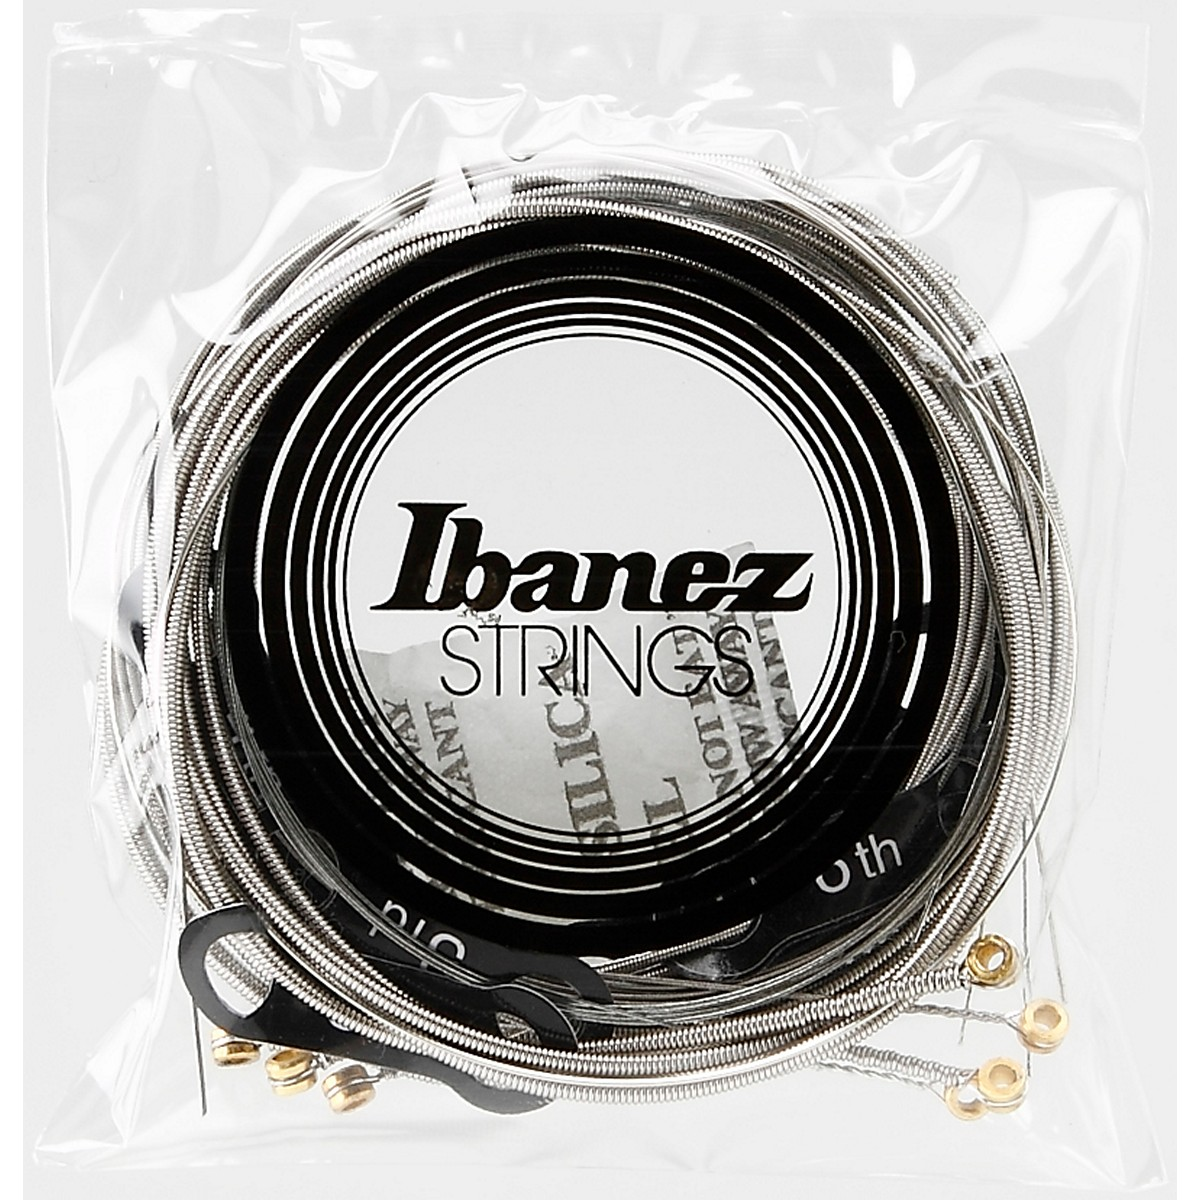 IBANEZ IEGS9 - MUTA CHITARRA ELETTRICA 9 CORDE 009-090